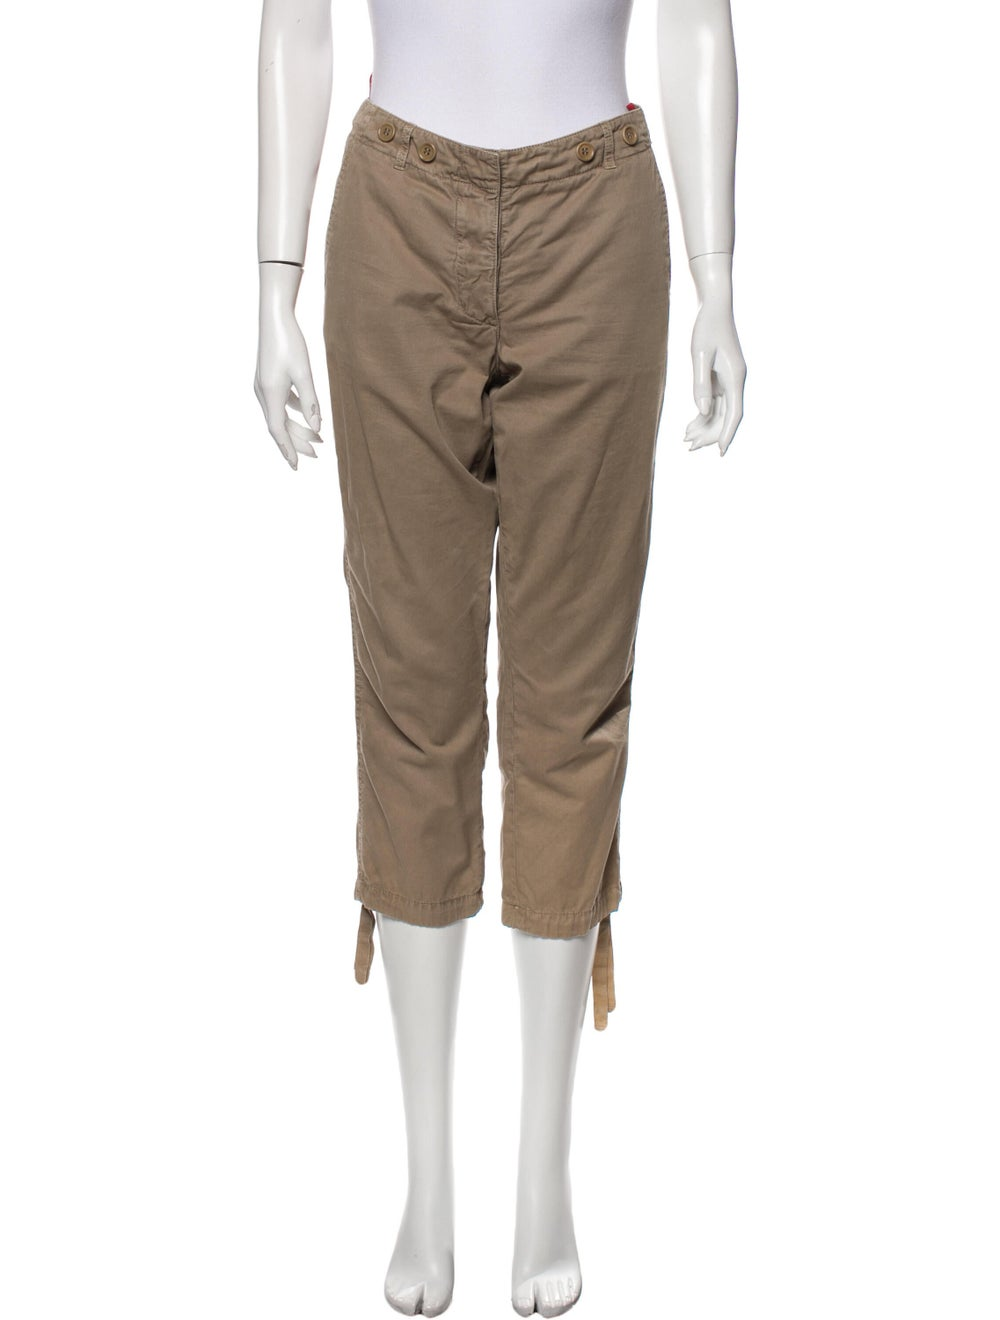 Prada Sport Straight Leg Pants - image 1